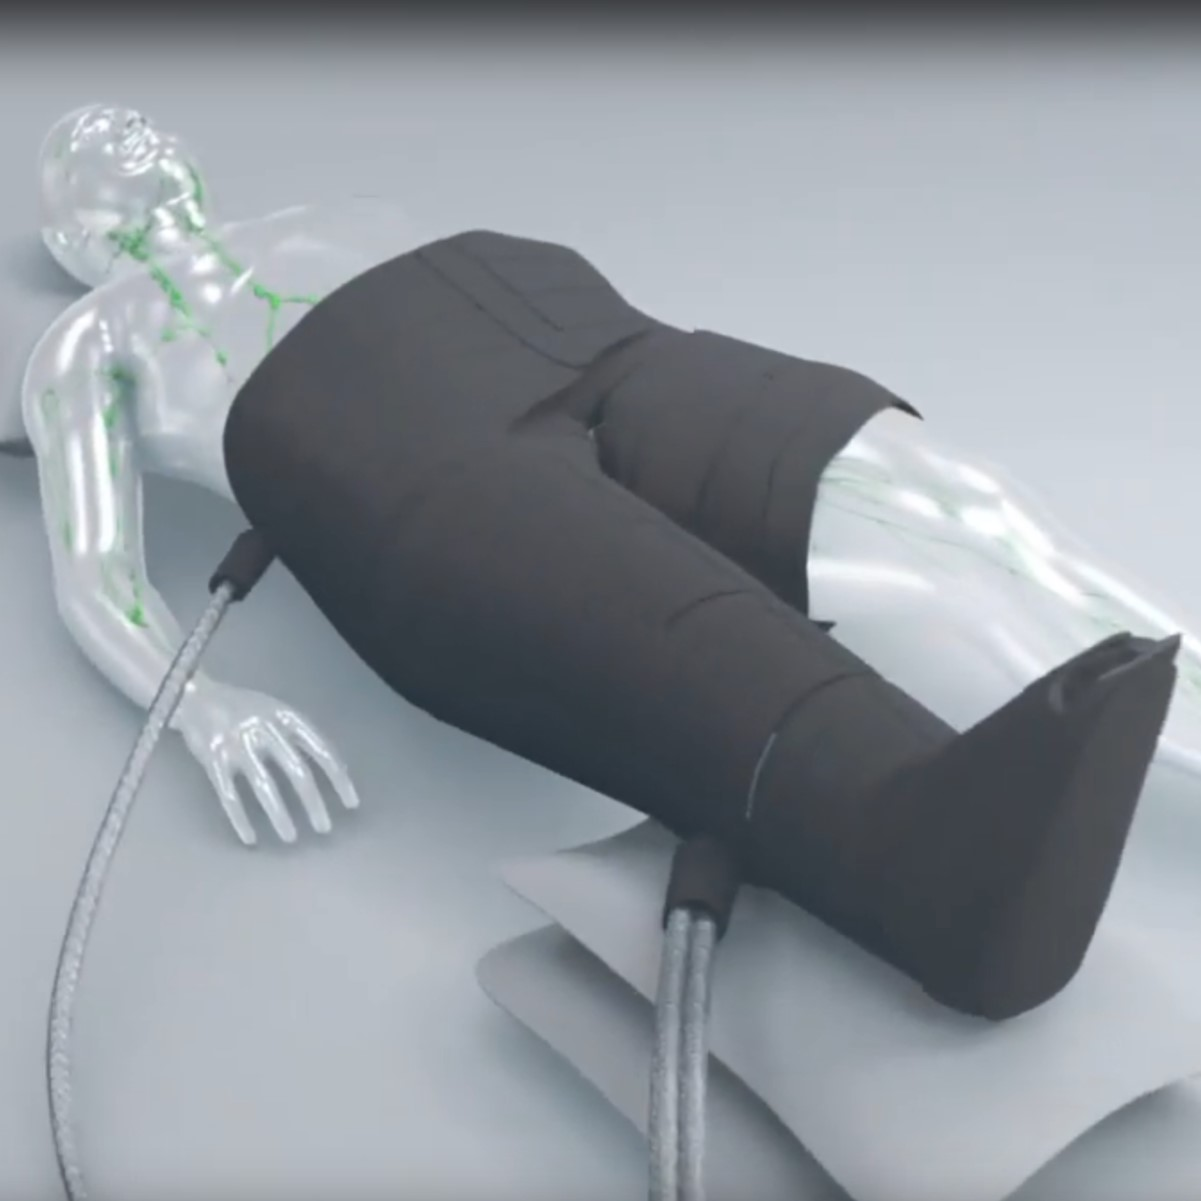 Nottingham Spirk Medical Device Innovation - Flexitouch Plus